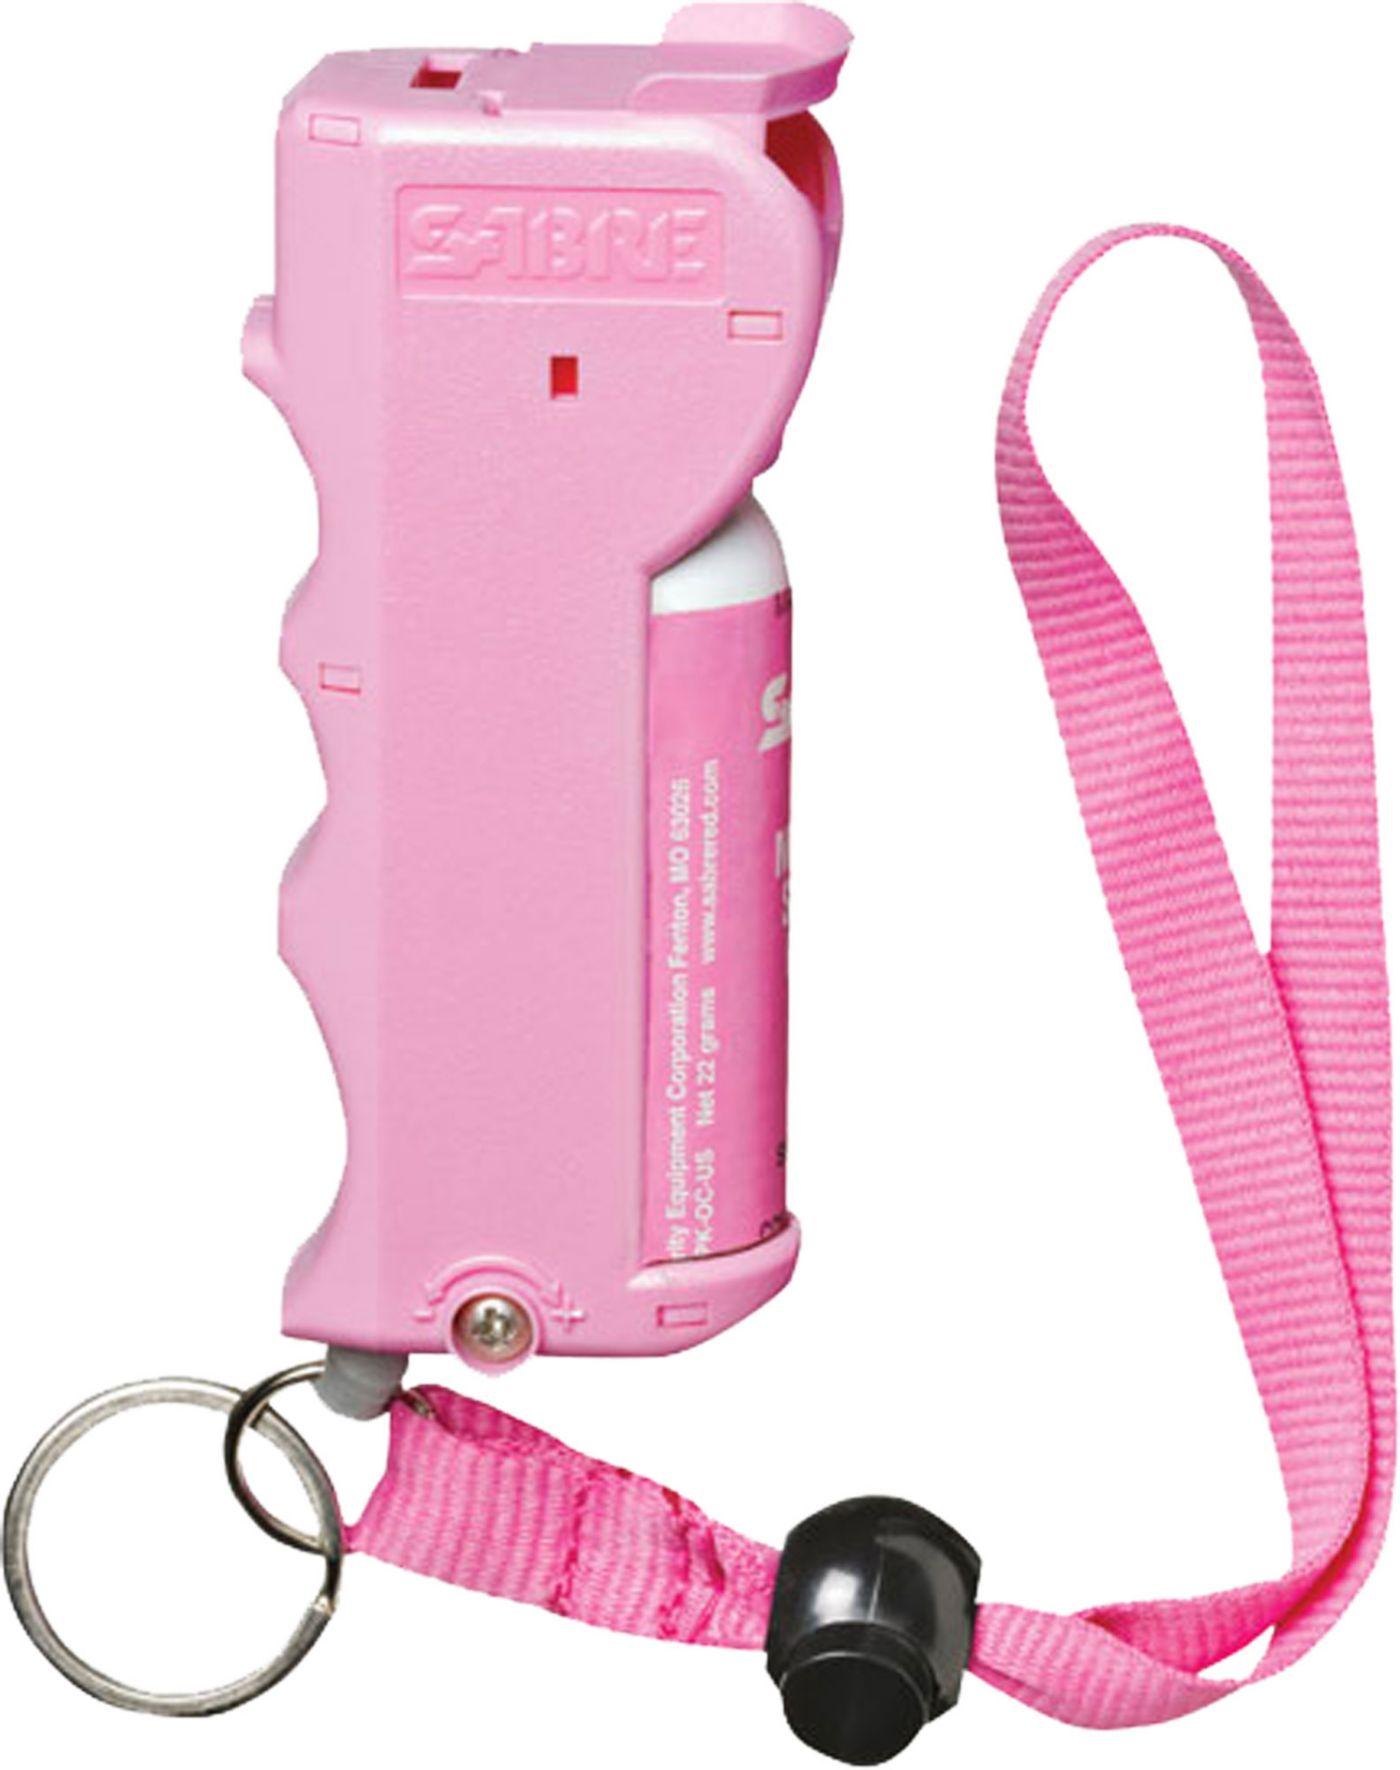 SABRE Stop Strap Pepper Spray